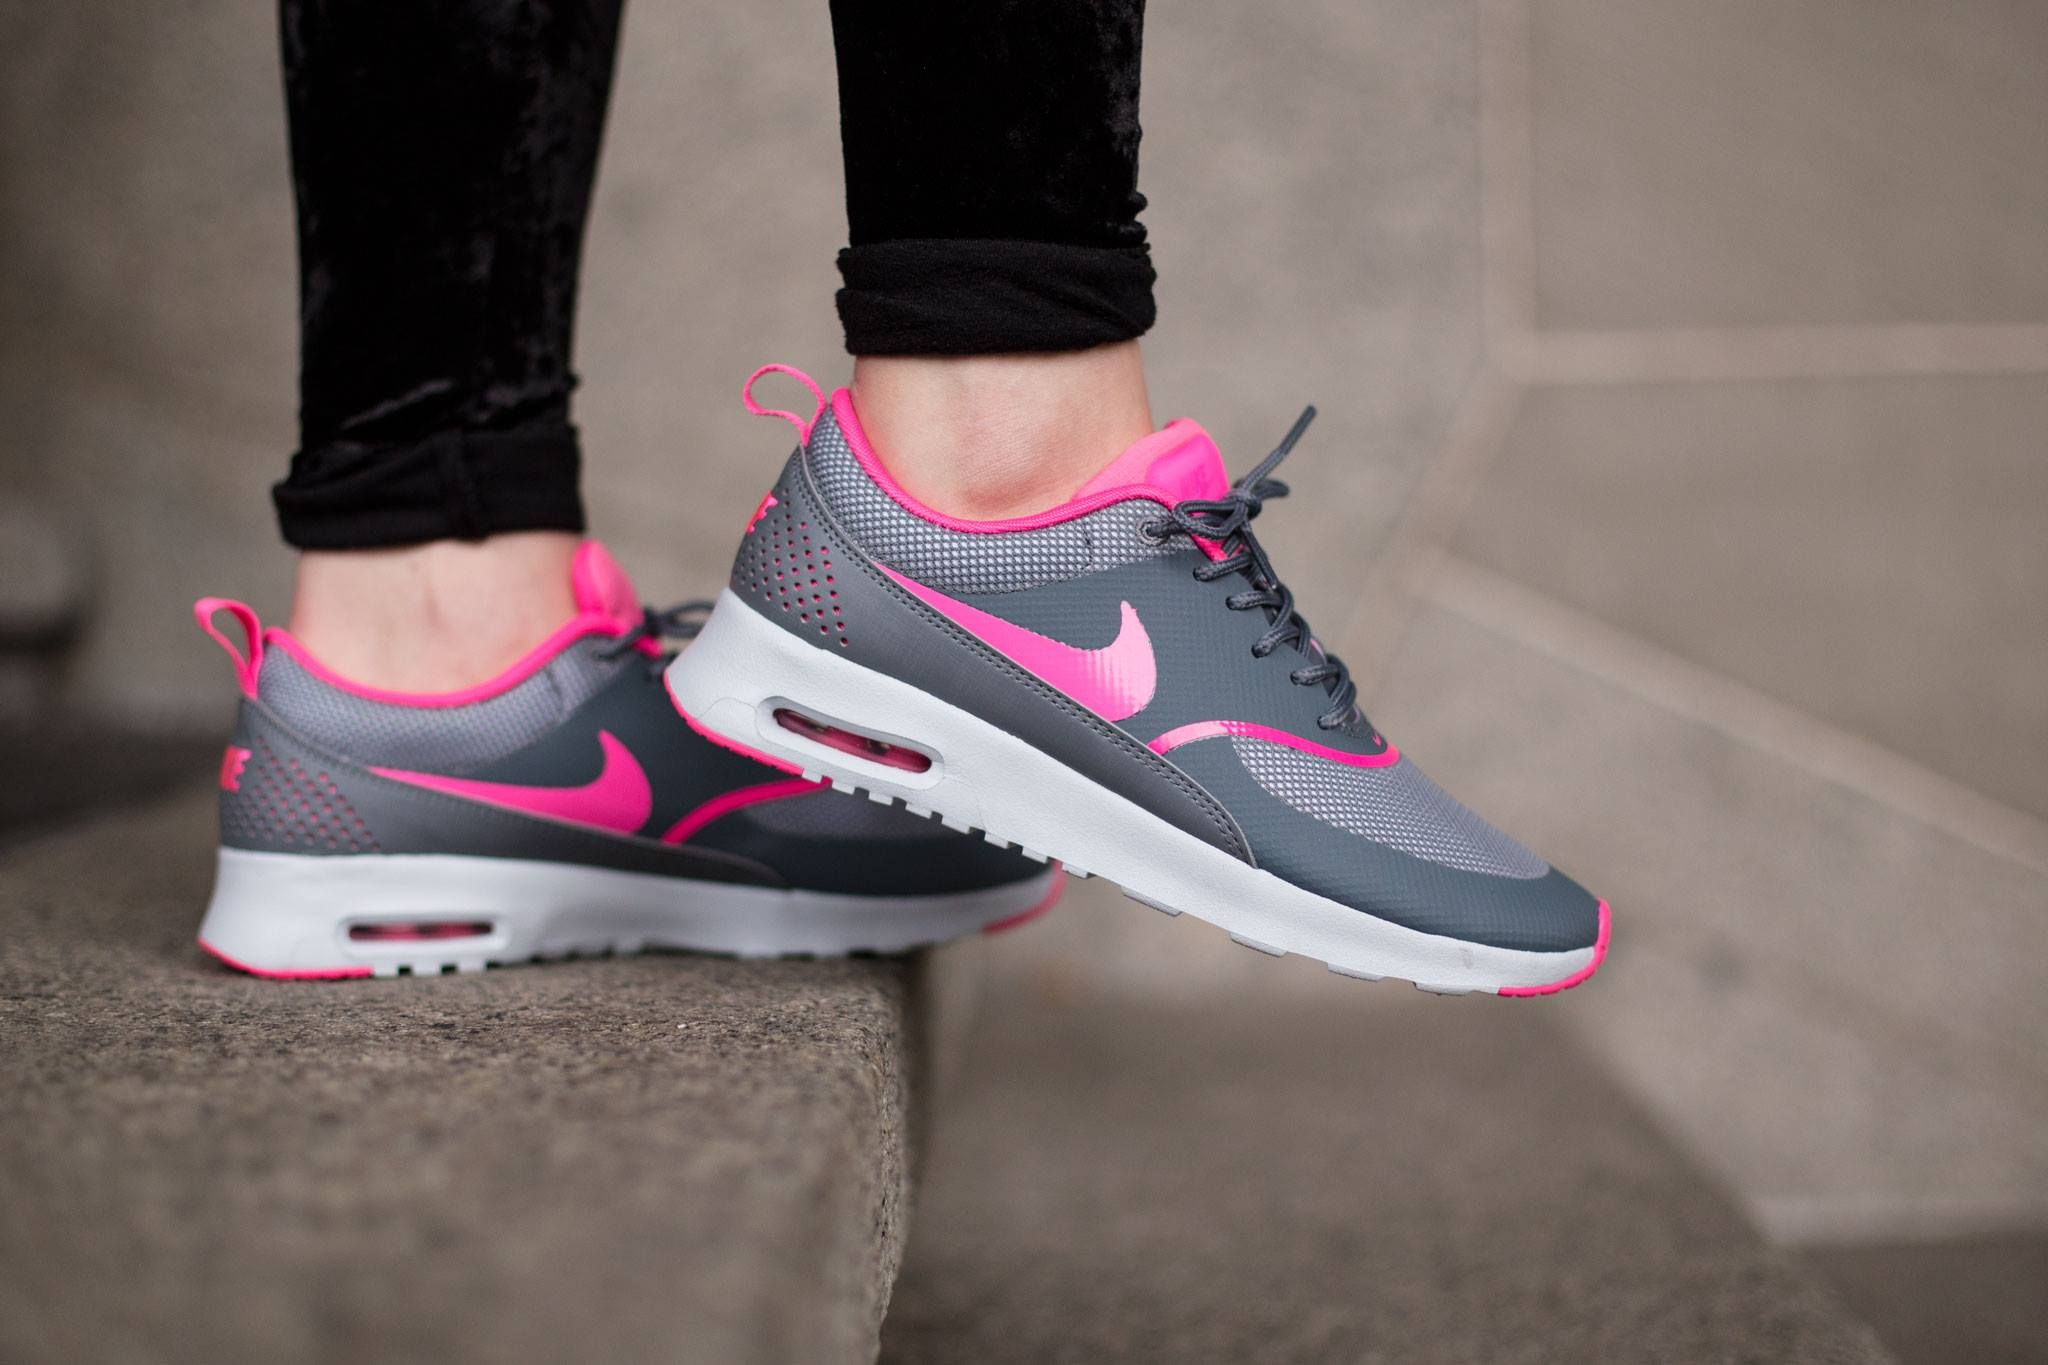 Nike Air Max Thea Grey Pink Nike Air Max Nike Free Shoes Nike Runners